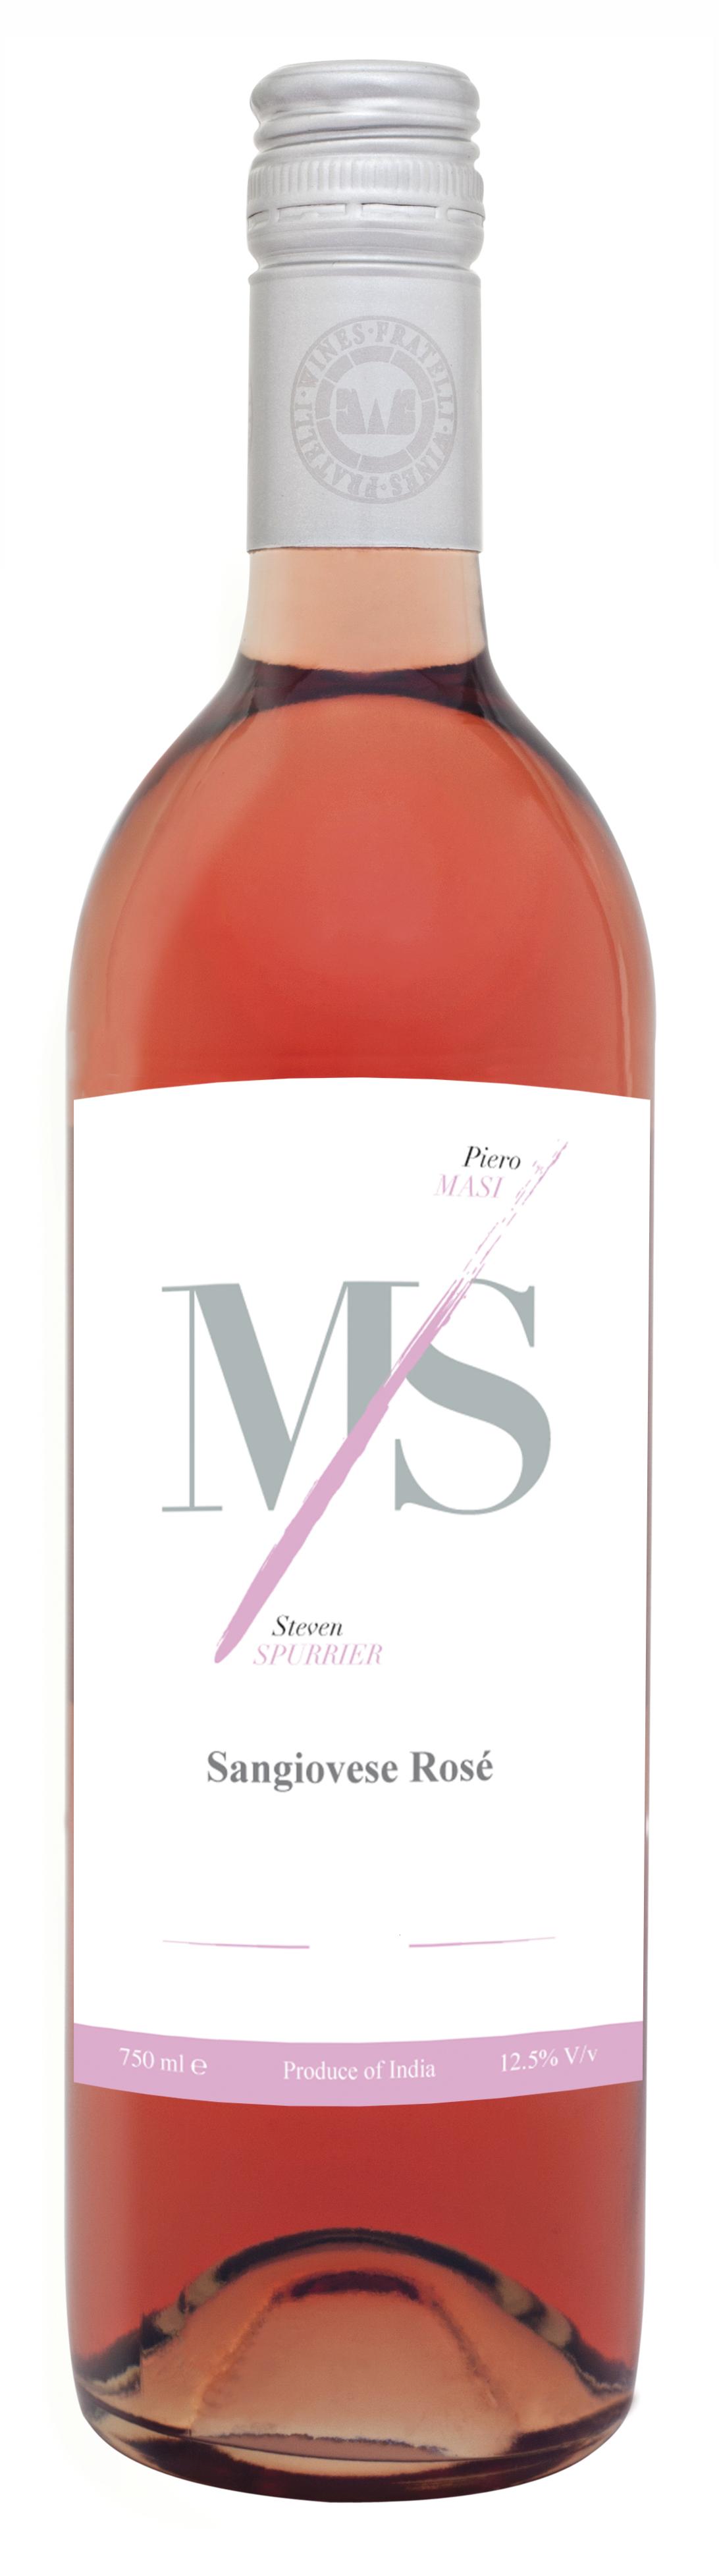 M/S, Akluj Sangiovese Rosé 2017